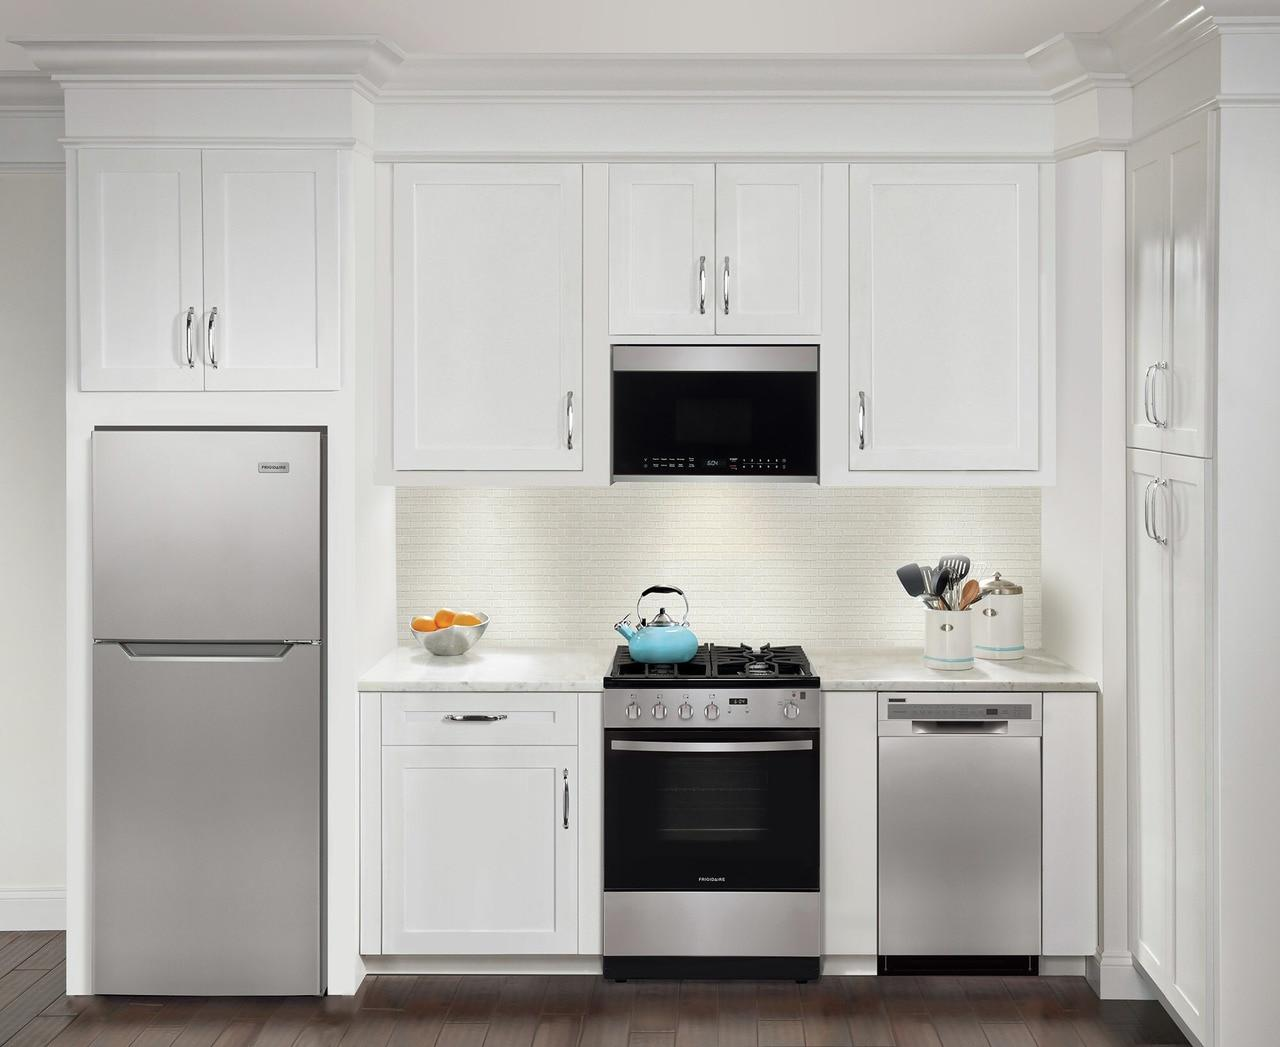 11.6 Cu. Ft. Top Freezer Apartment-Size Refrigerator Photo #2